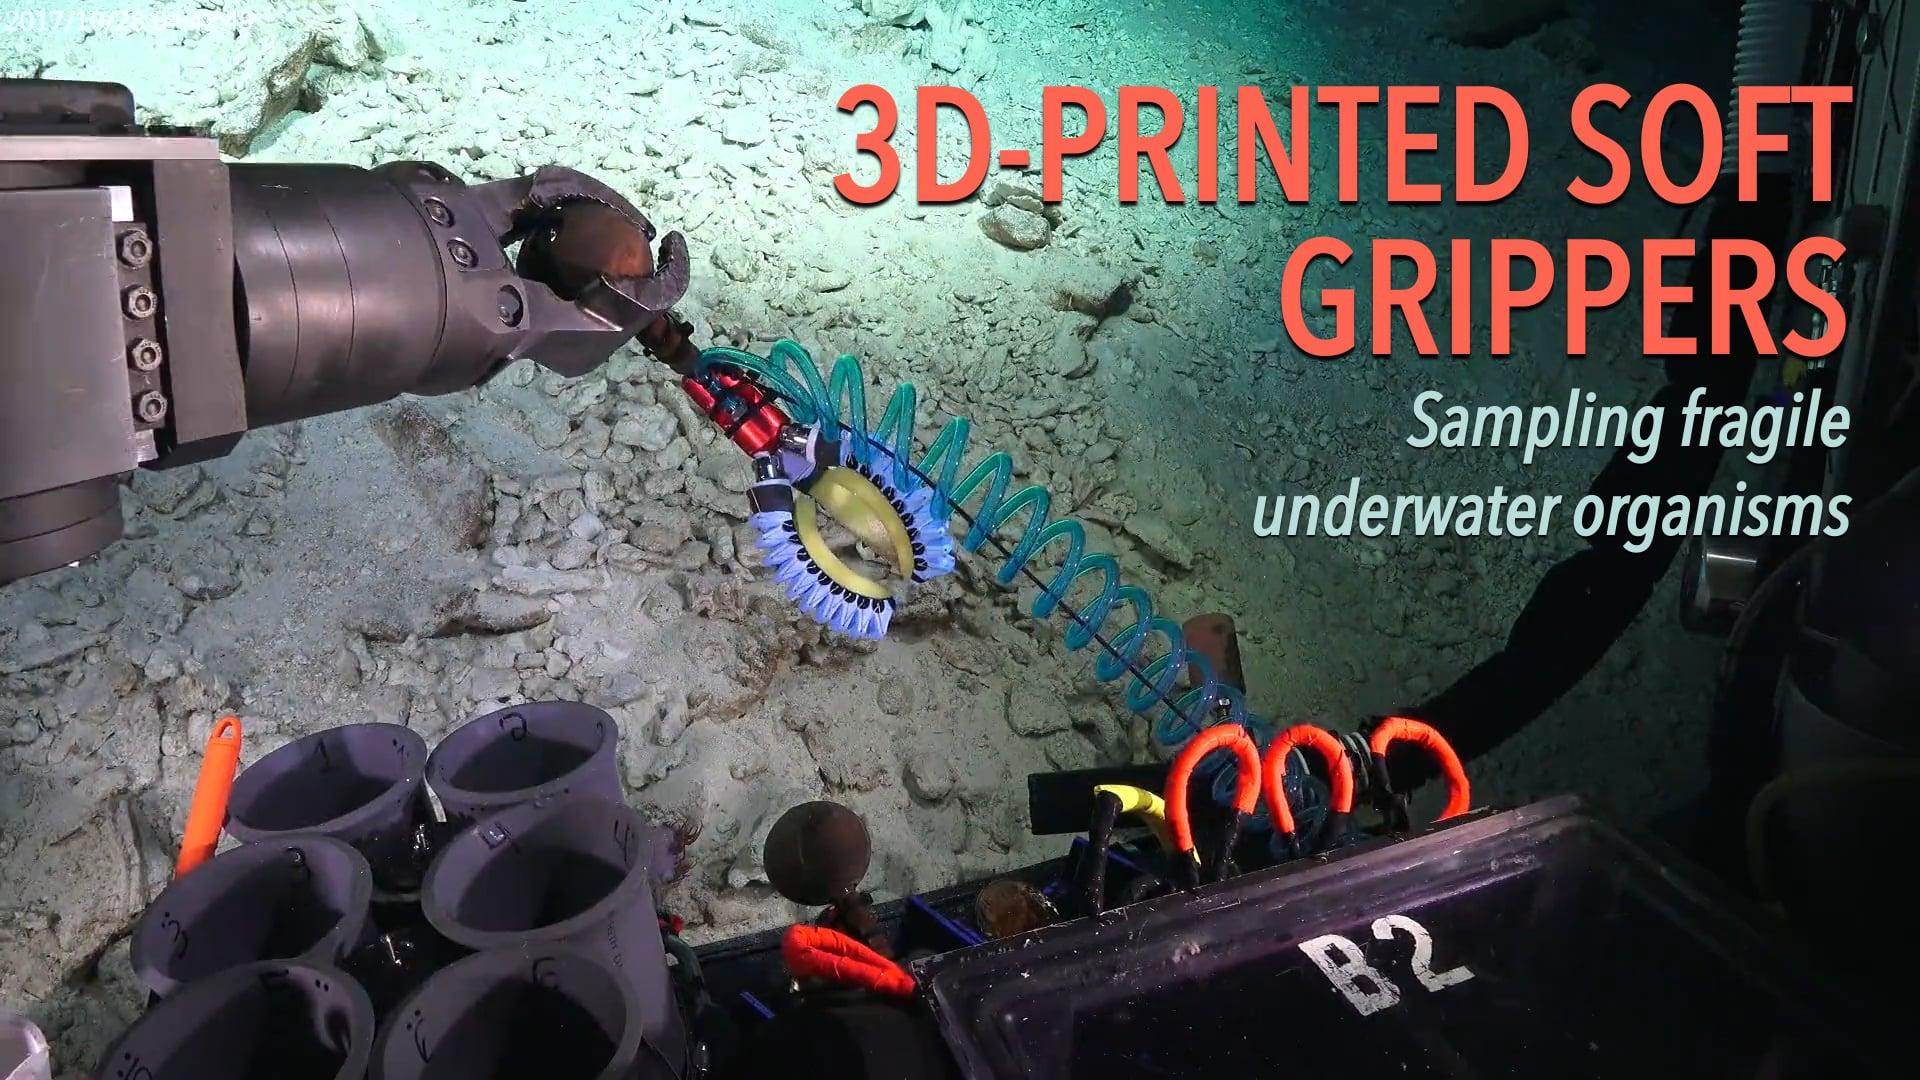 3D-Printed Soft Grippers: Sampling fragile underwater organisms